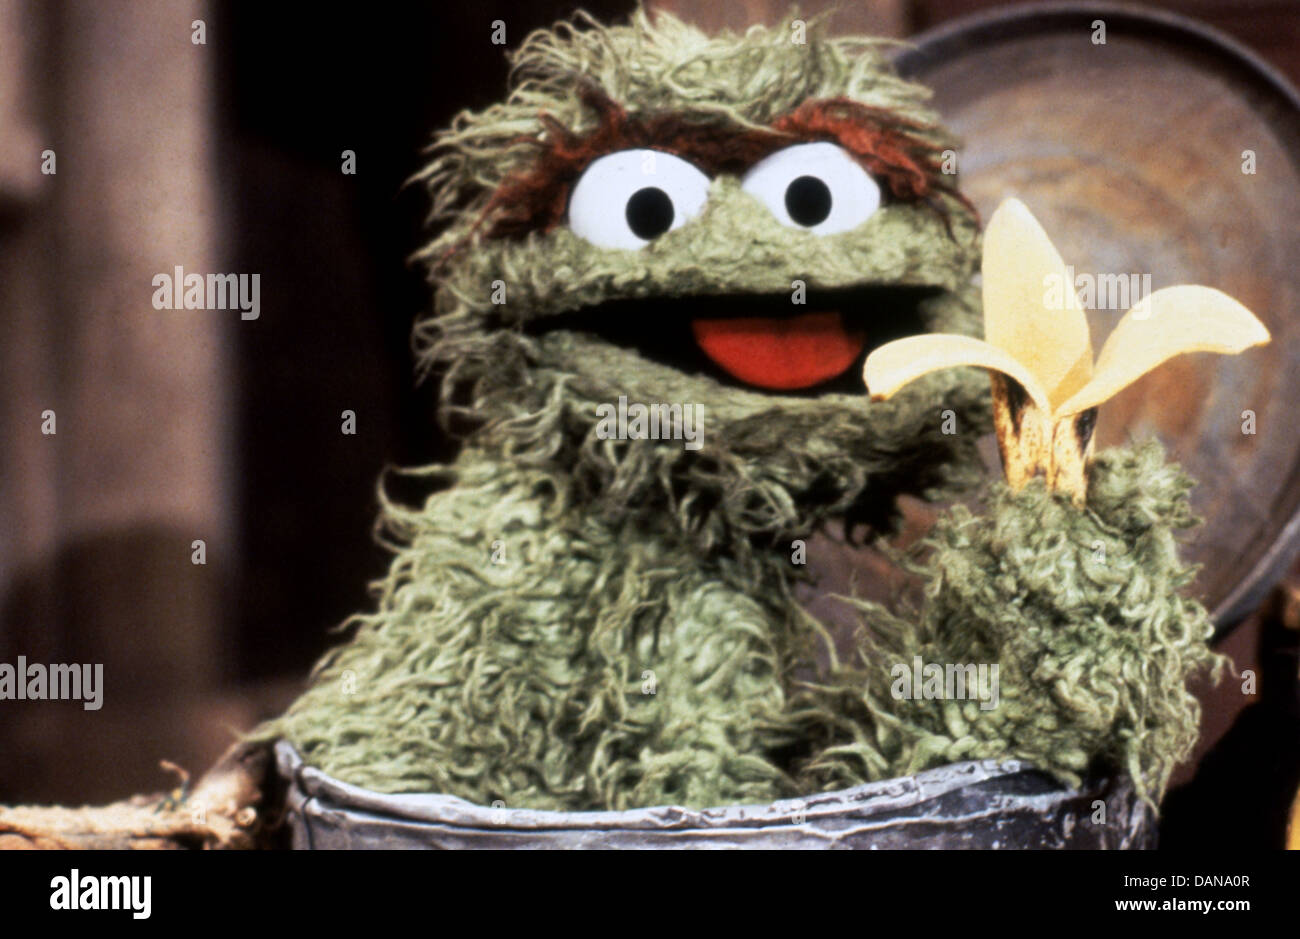 Sesame Street Stock Photos Sesame Street Stock Images Alamy